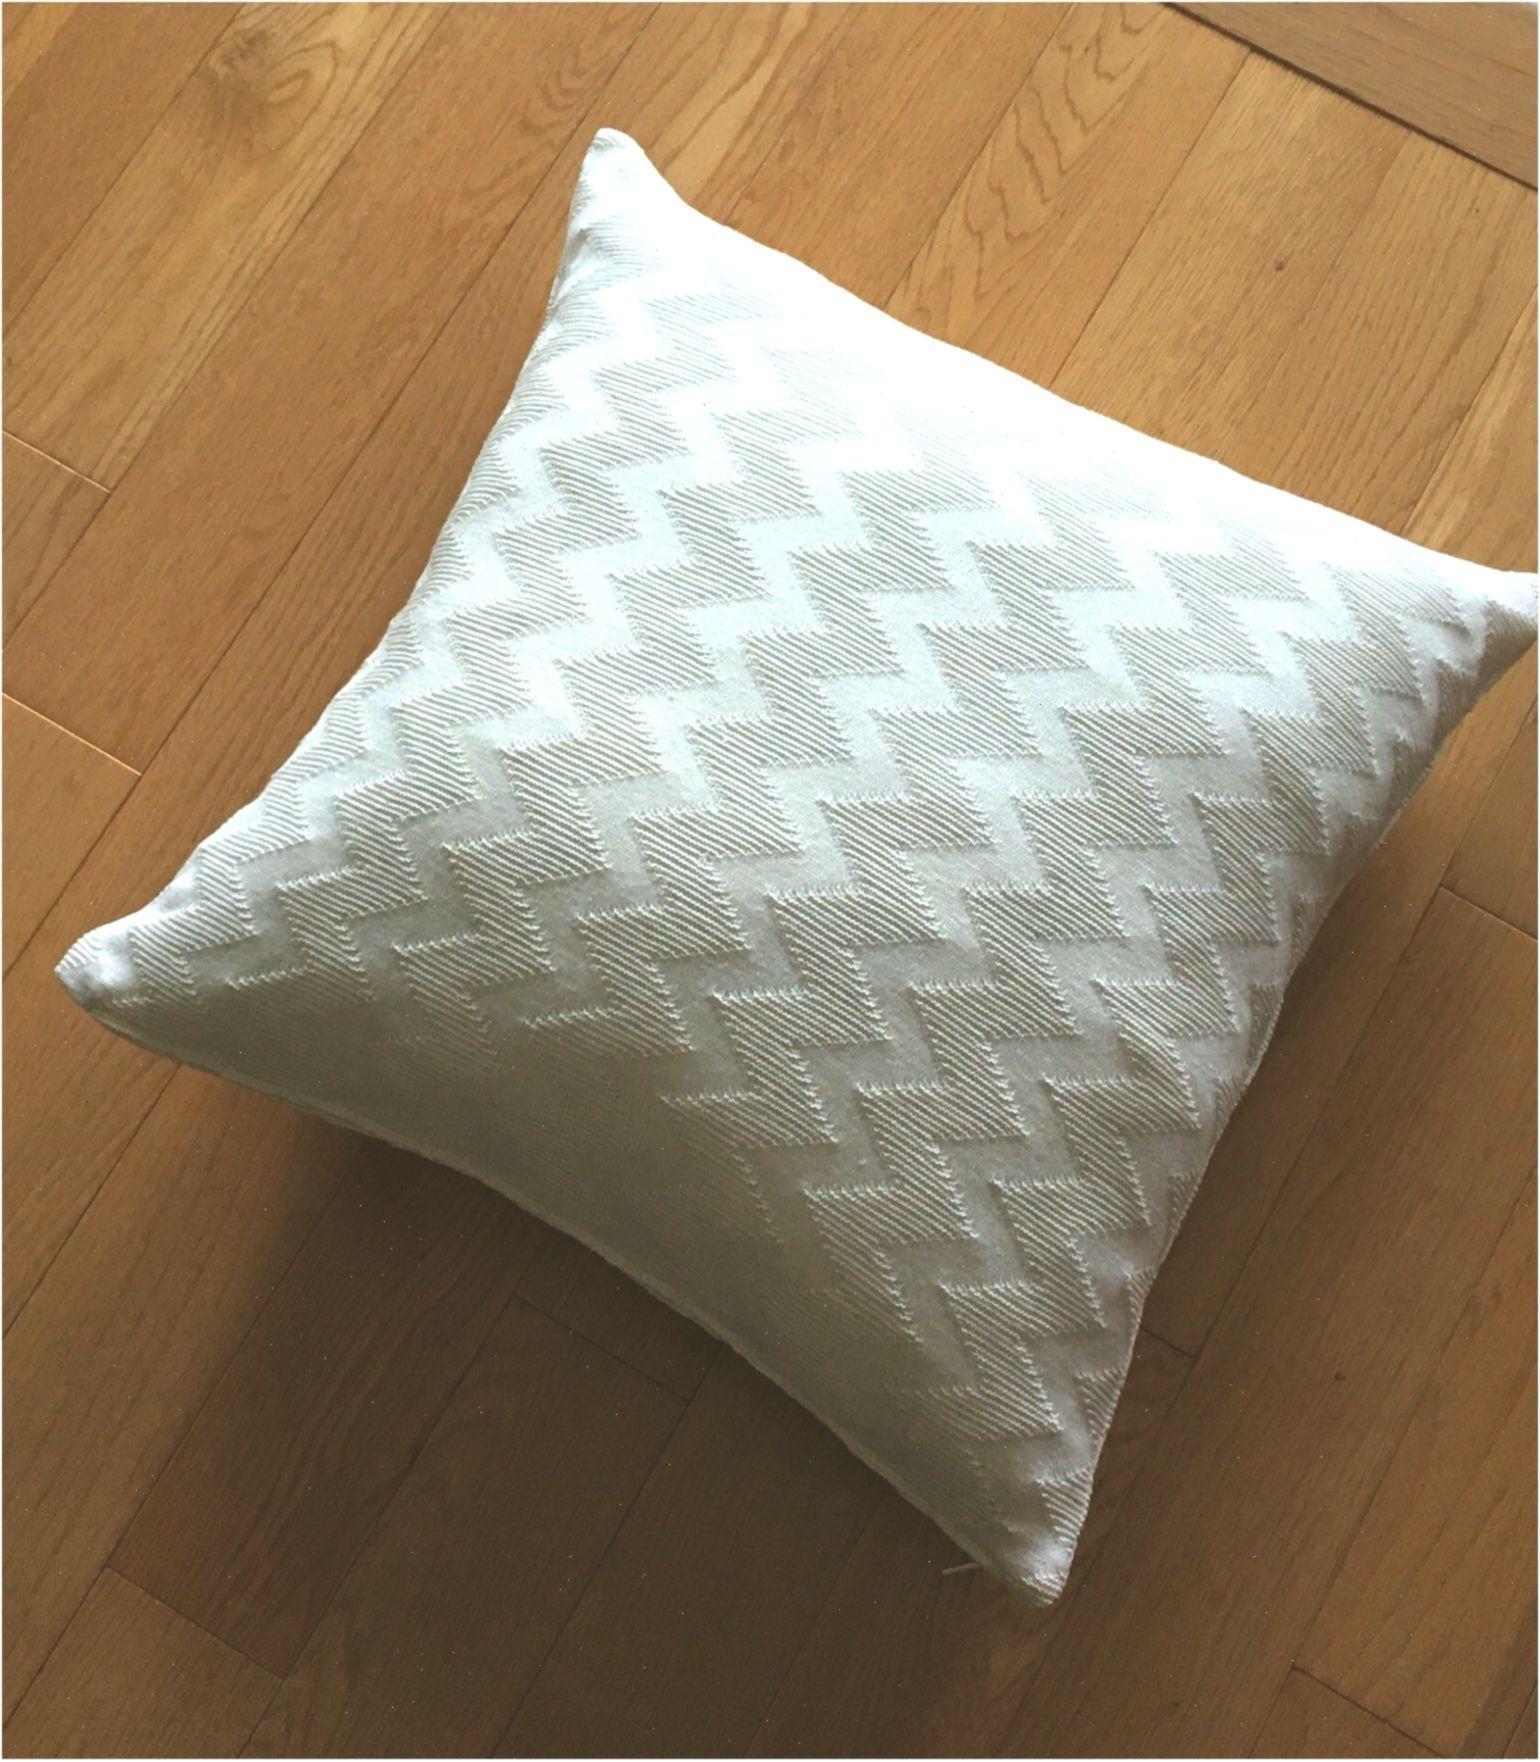 Textured Natural Throw Pillow Modern Sofa Pillow Cover Cream Off White Geometric Pillow Pillowtex Sofa Pillow Covers Natural Throw Pillows Sofa Pillows